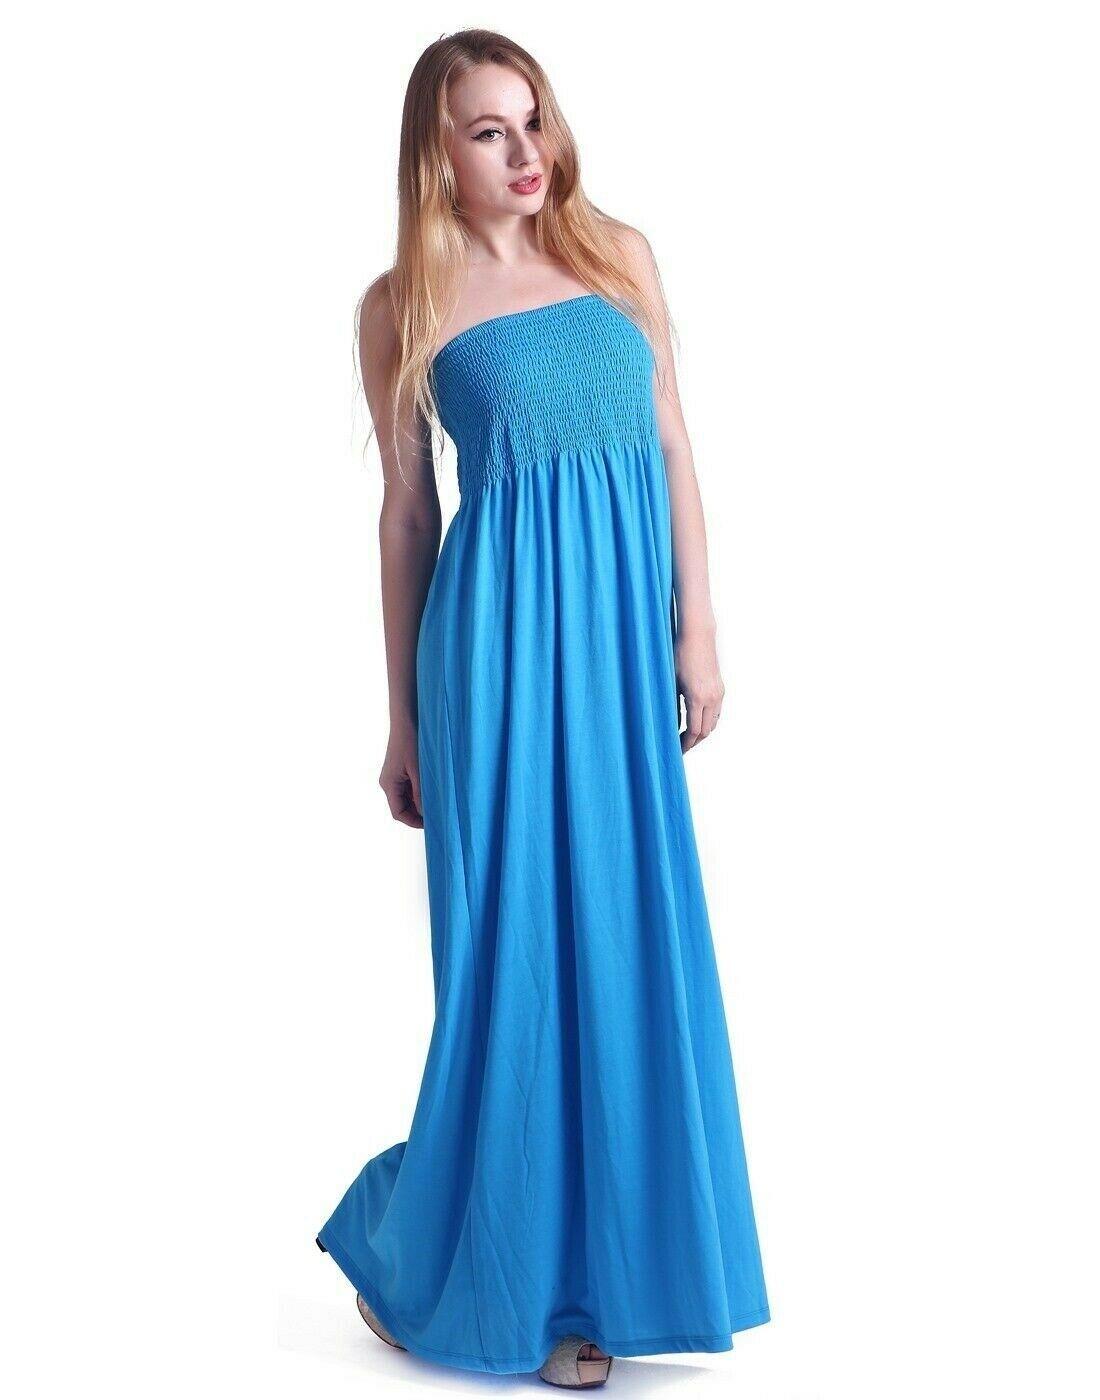 Details About Women S Strapless Maxi Dress Plus Size Tube